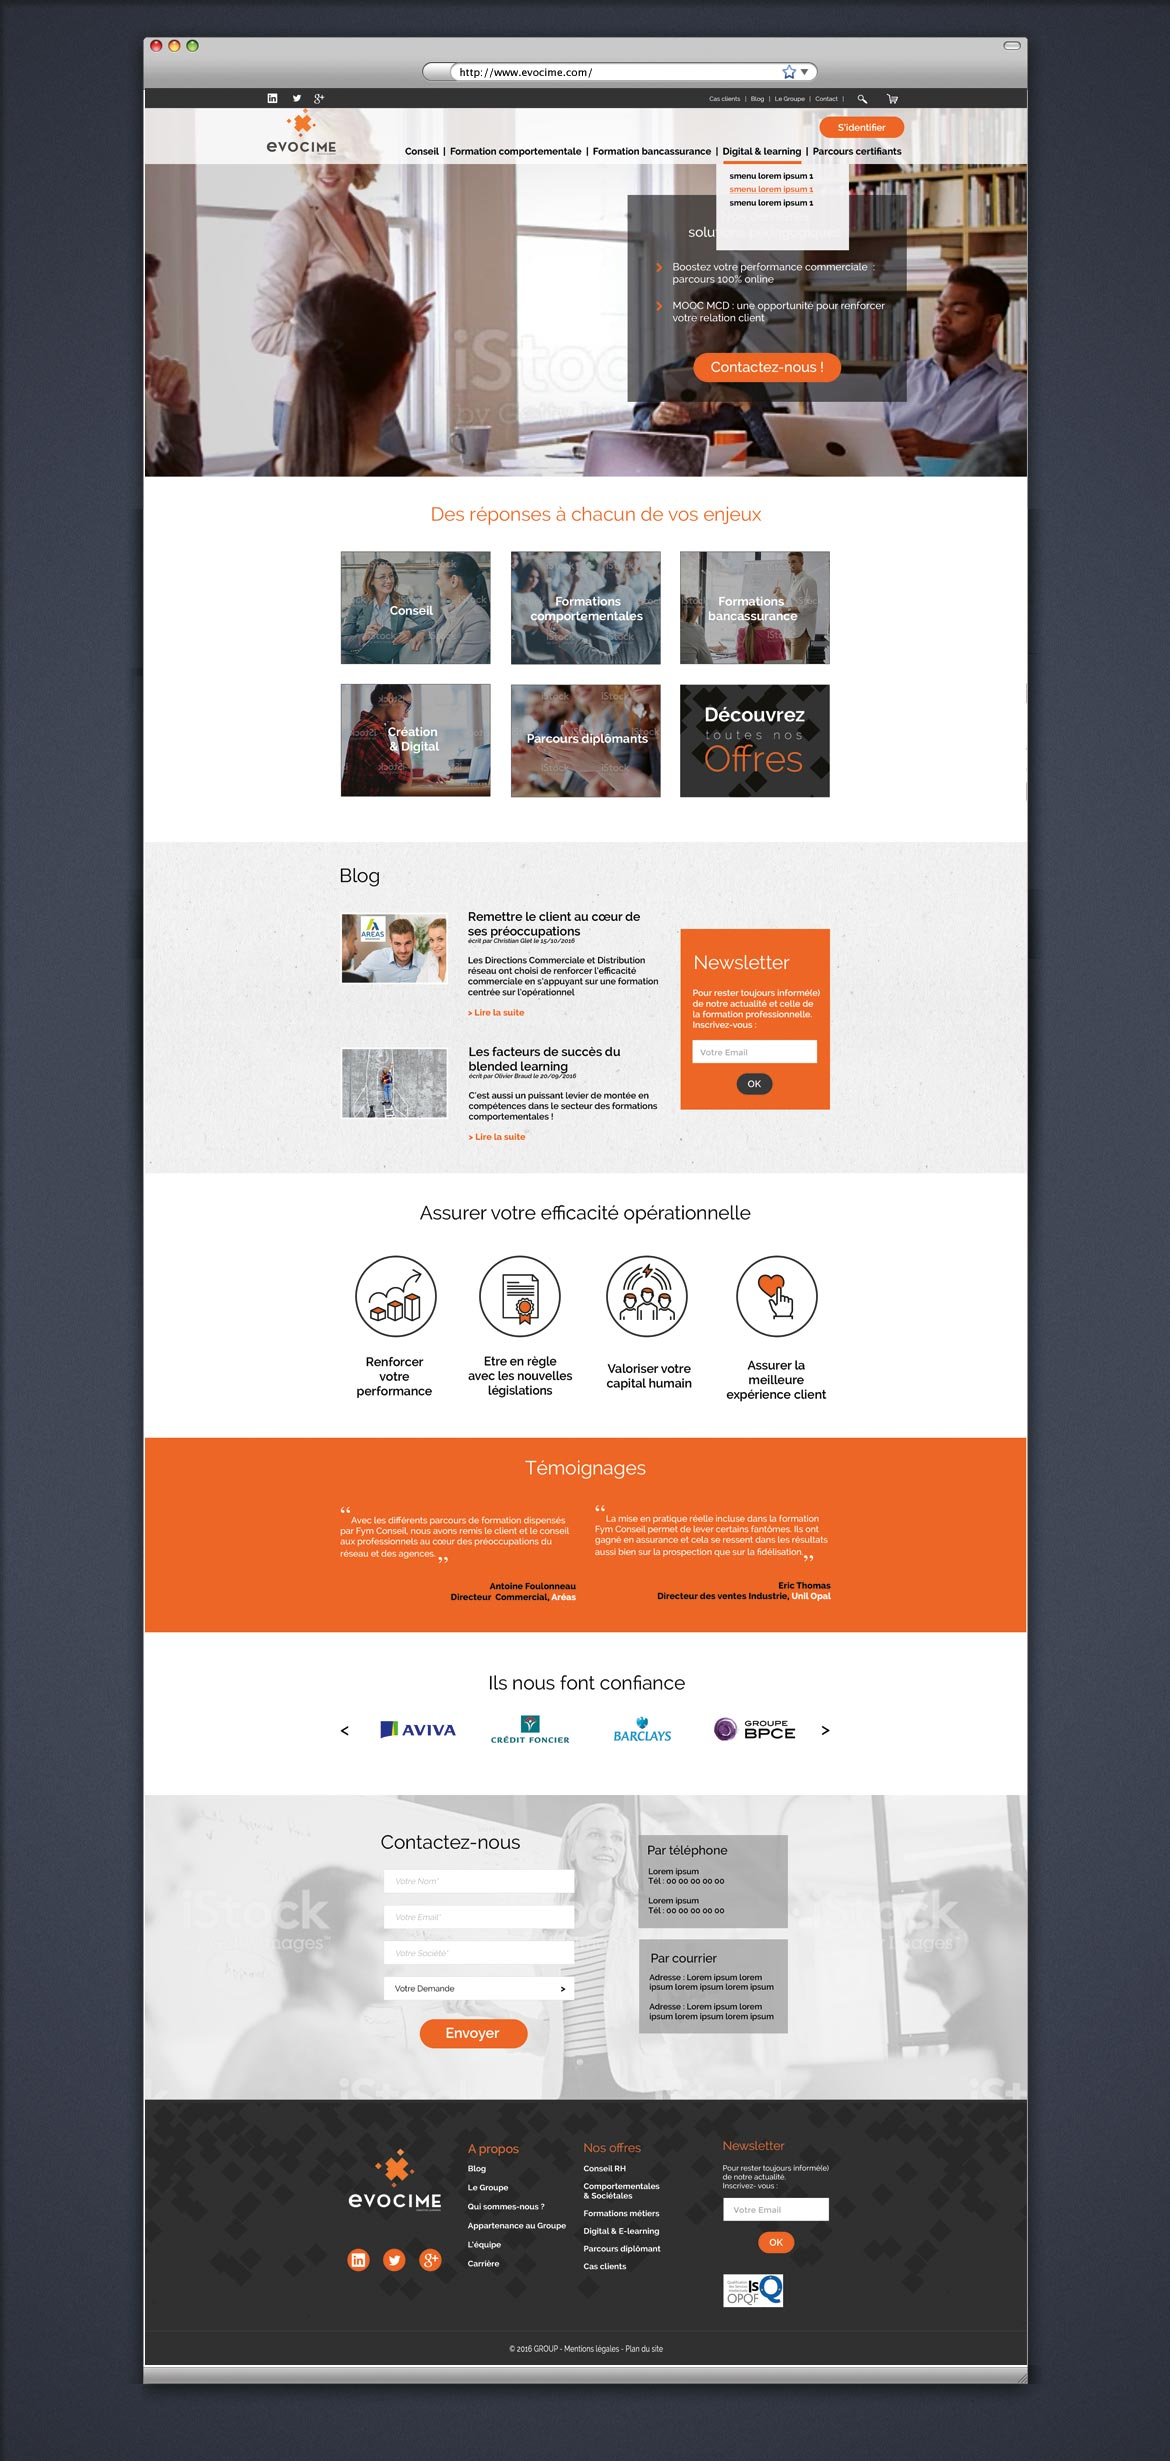 Visuel de la maquette de la page d'accueil